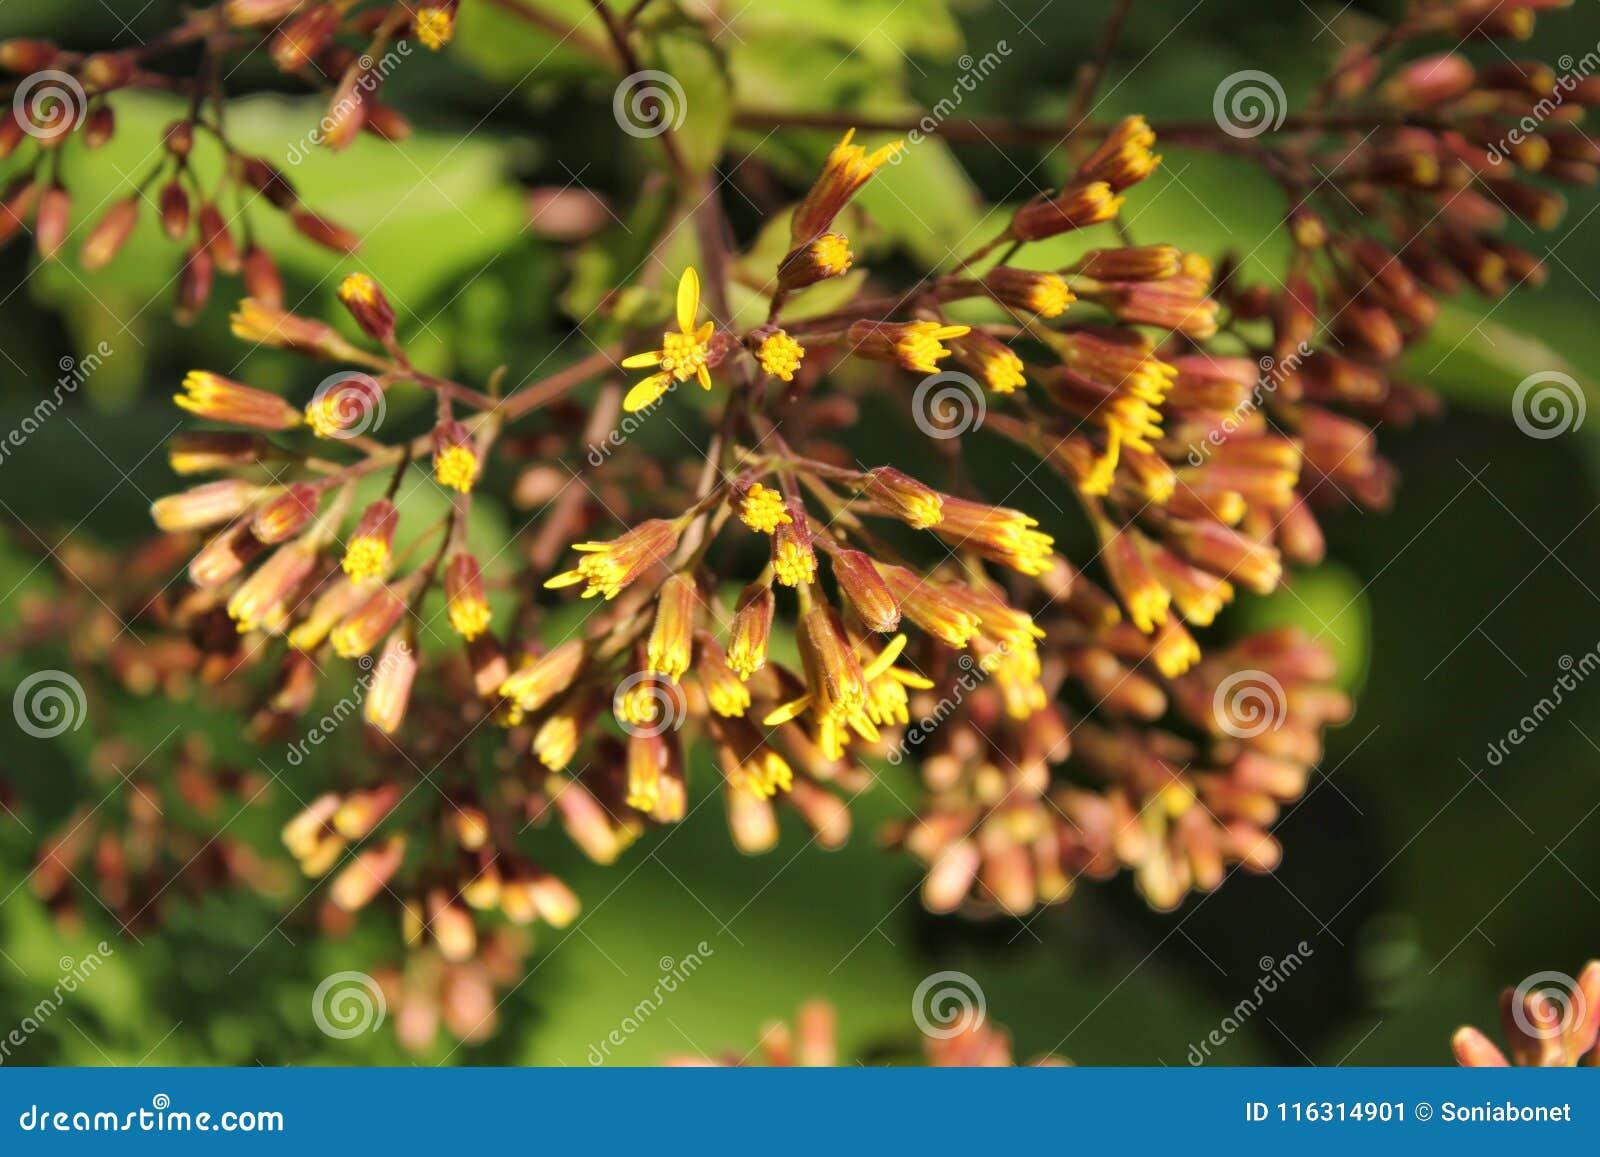 Colorful Senecio Petasitis Flowers In The Garden Stock Image - Image ...